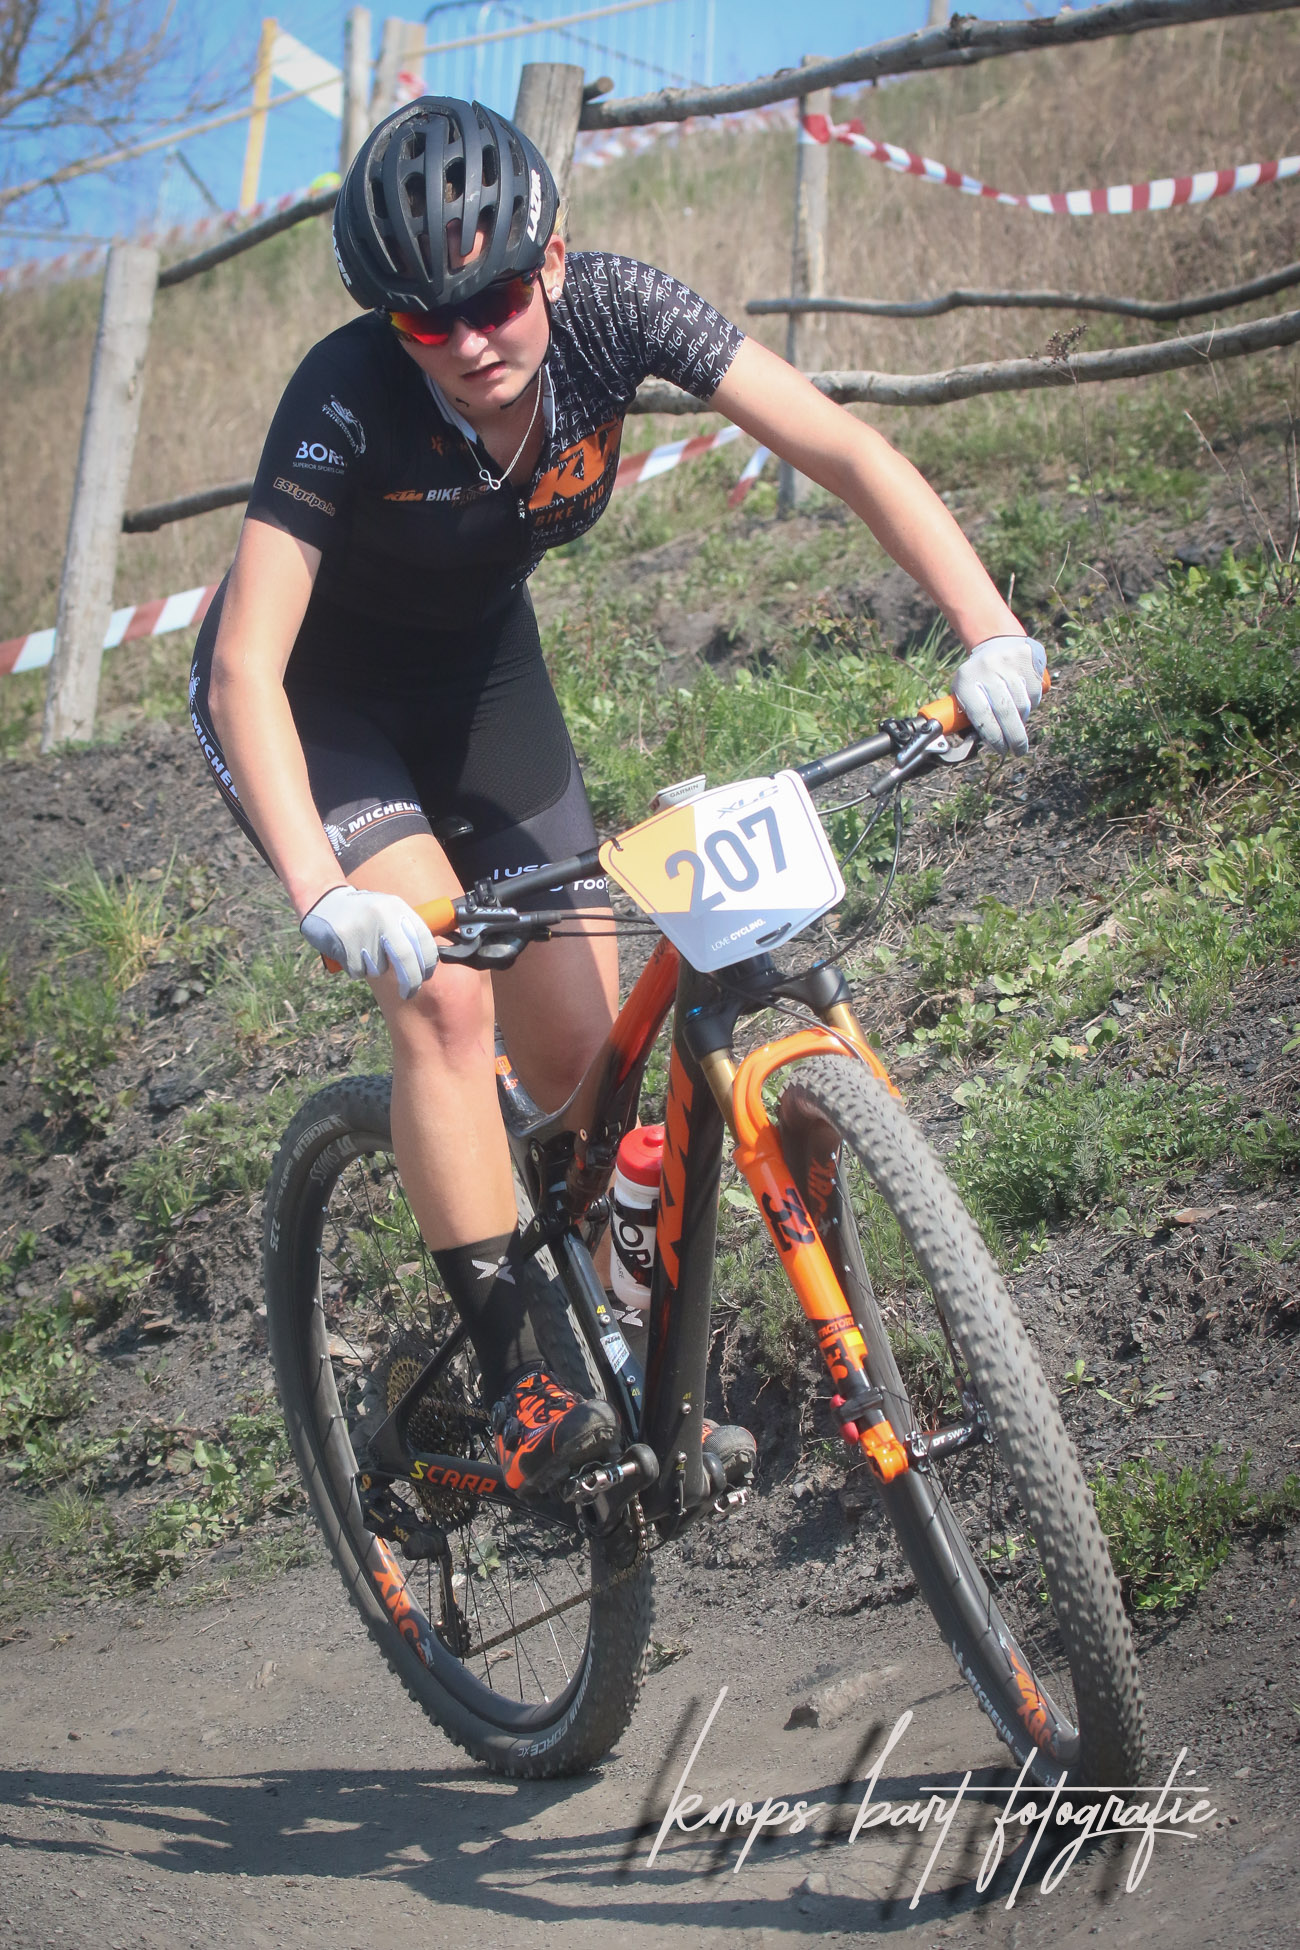 Didi de Vries derde in XCE wereldbeker in Valkenswaard